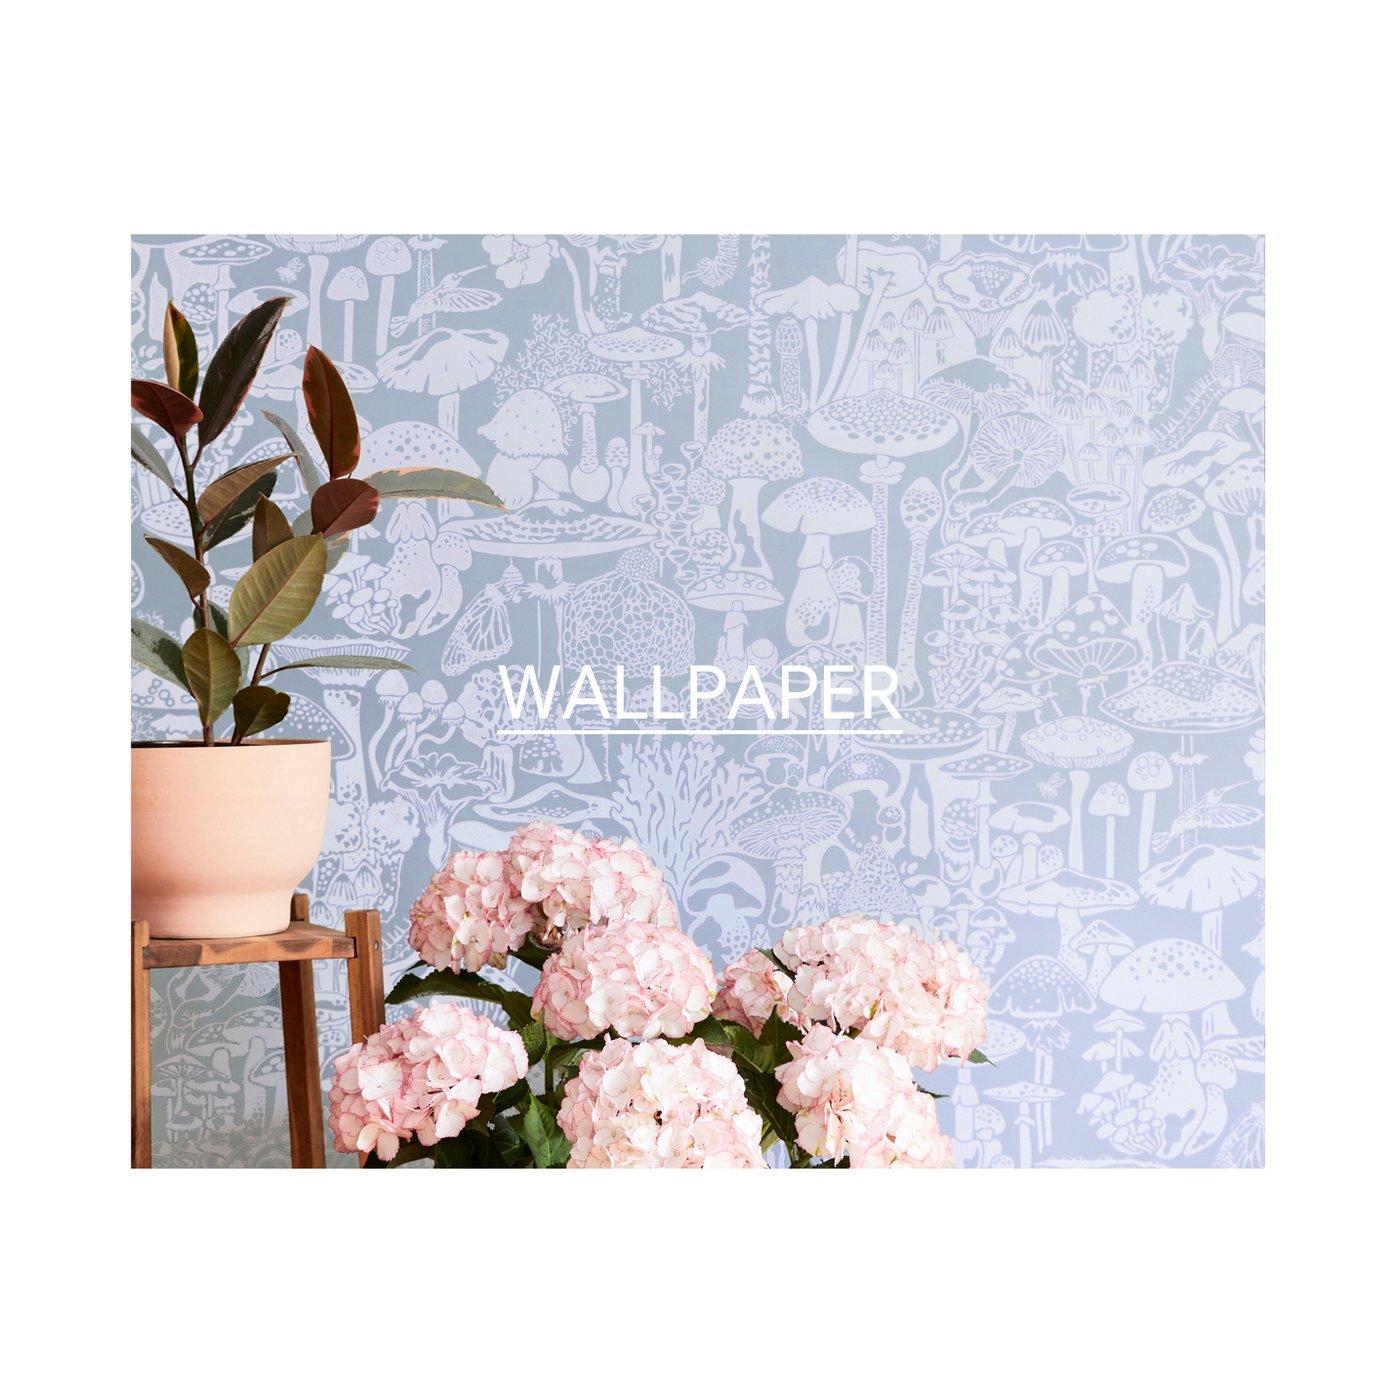 Aime Wilder Designer Wallpaper Fabrics Rugs Textiles Made in USA 1400x1400